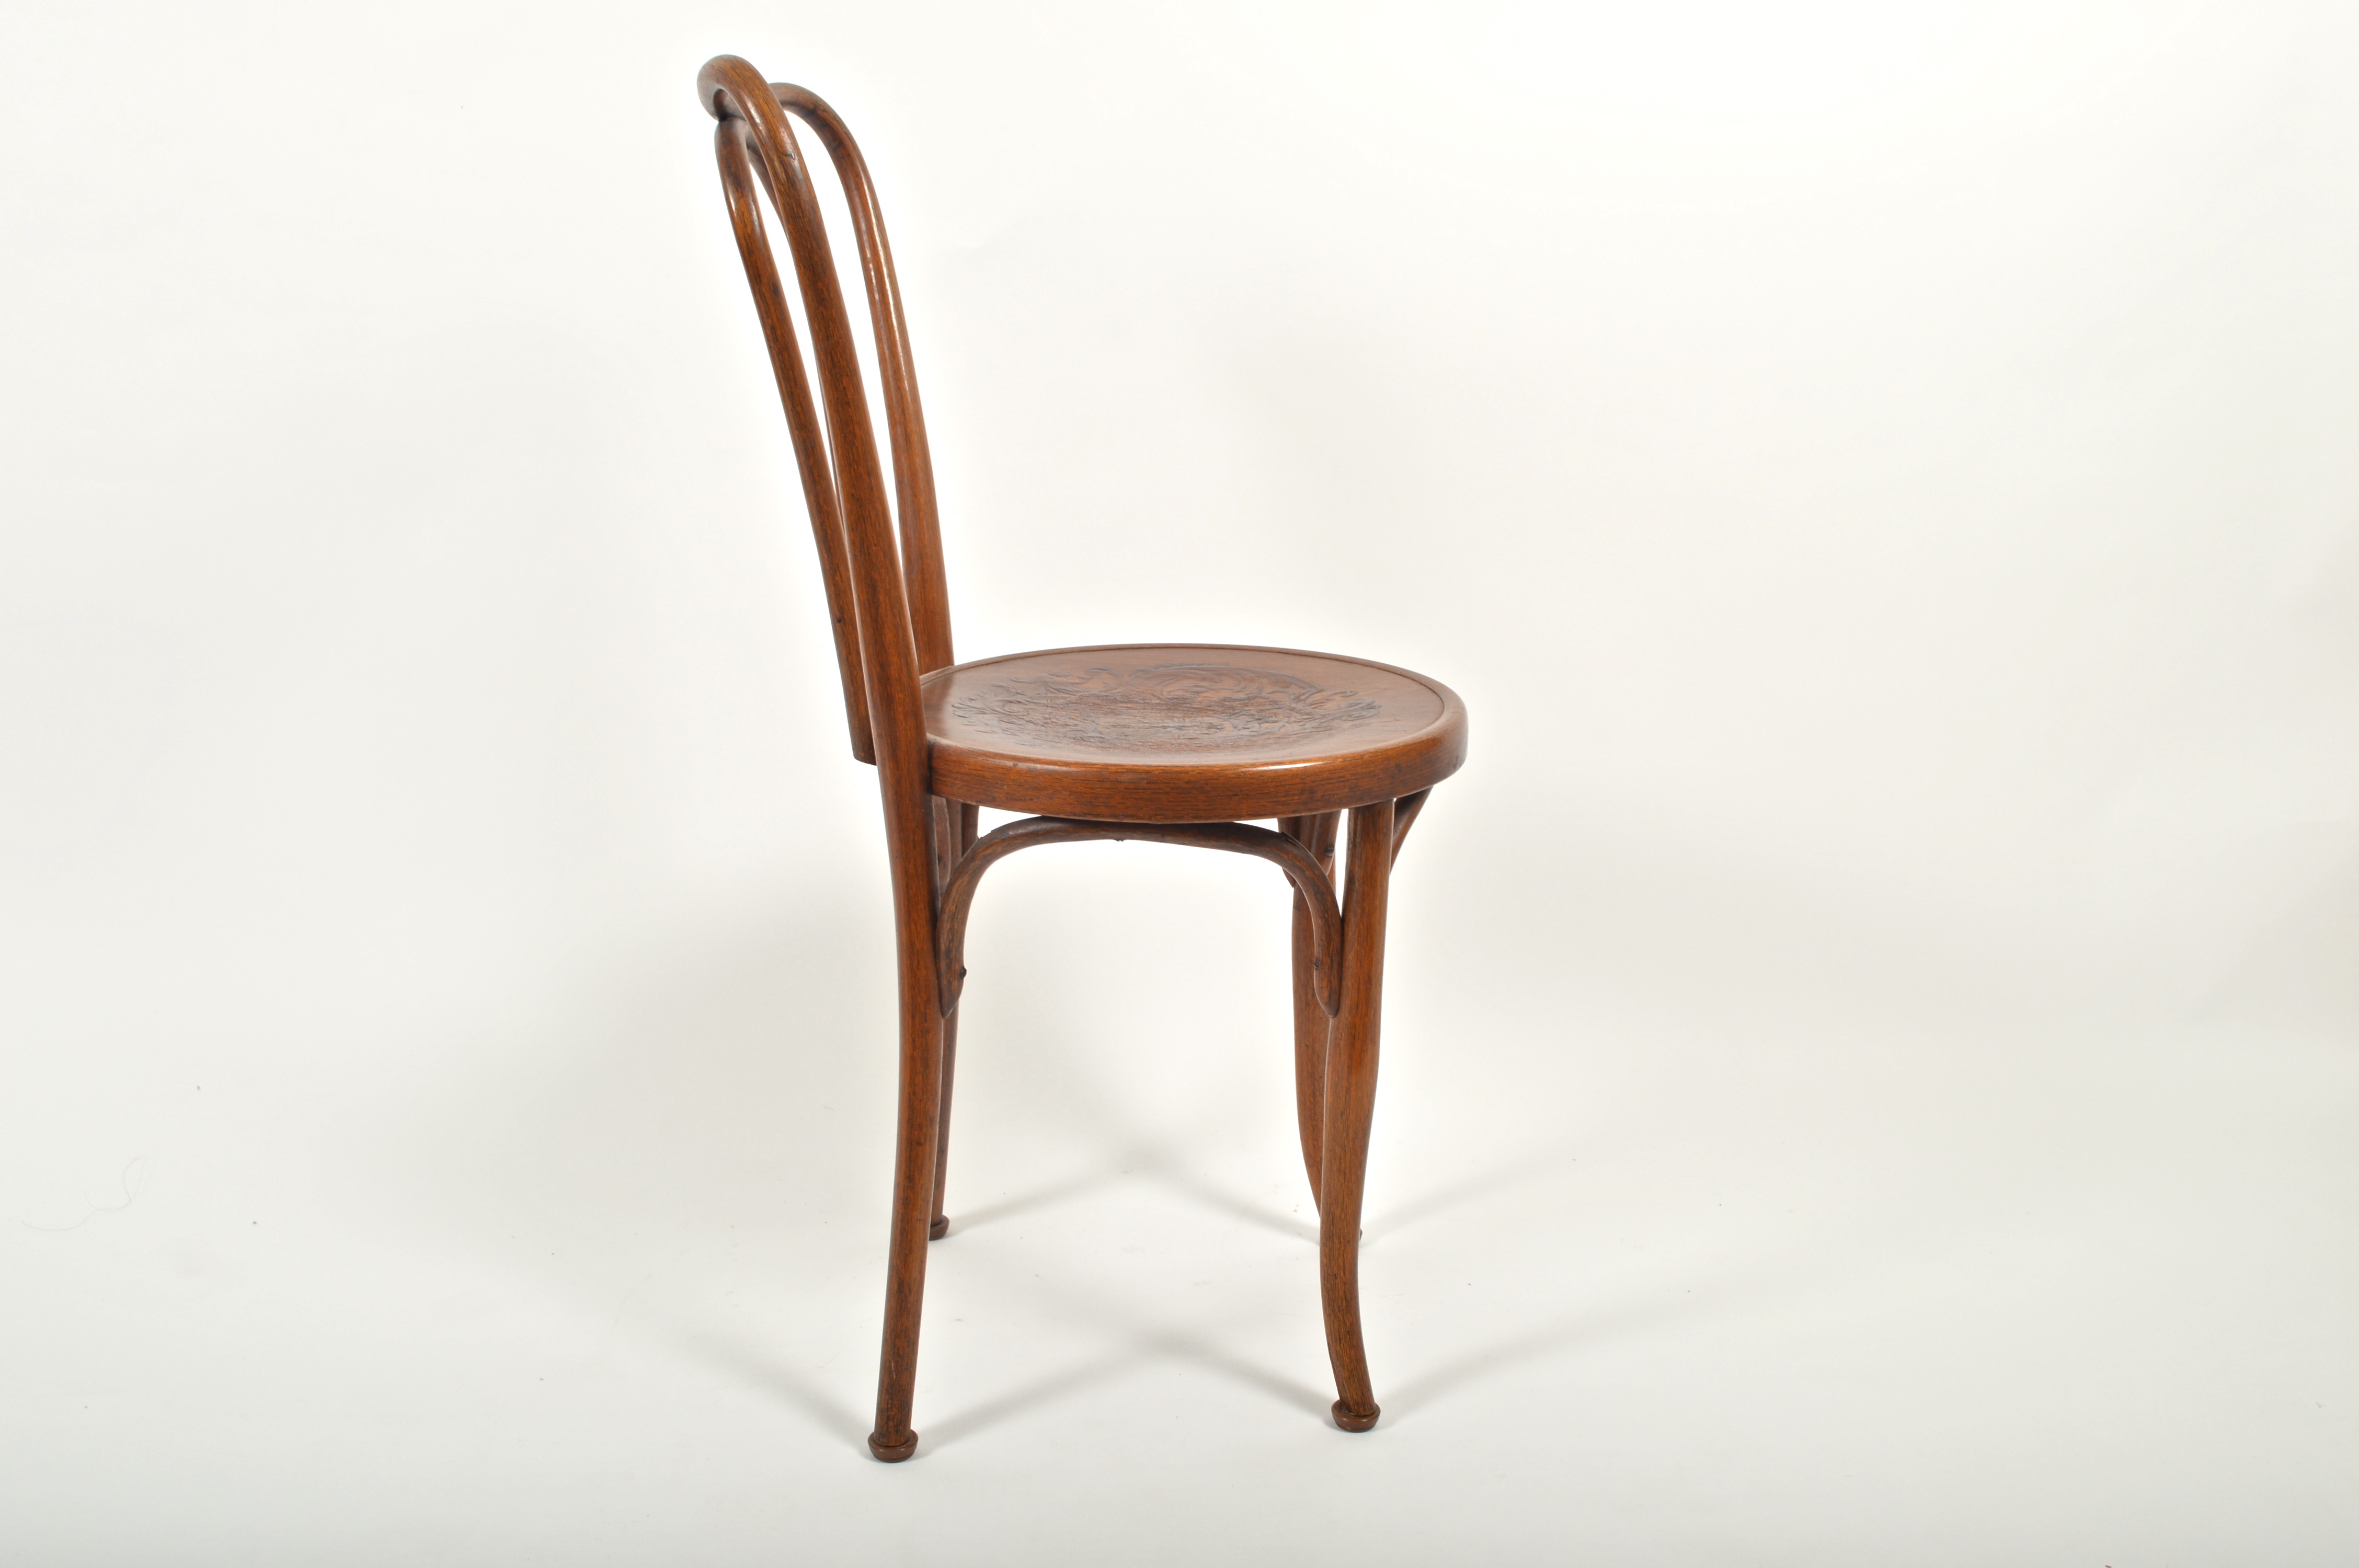 Rare Antique Austrian Jacob u0026 Josef Kohn Bentwood Cafe Chair : EBTH